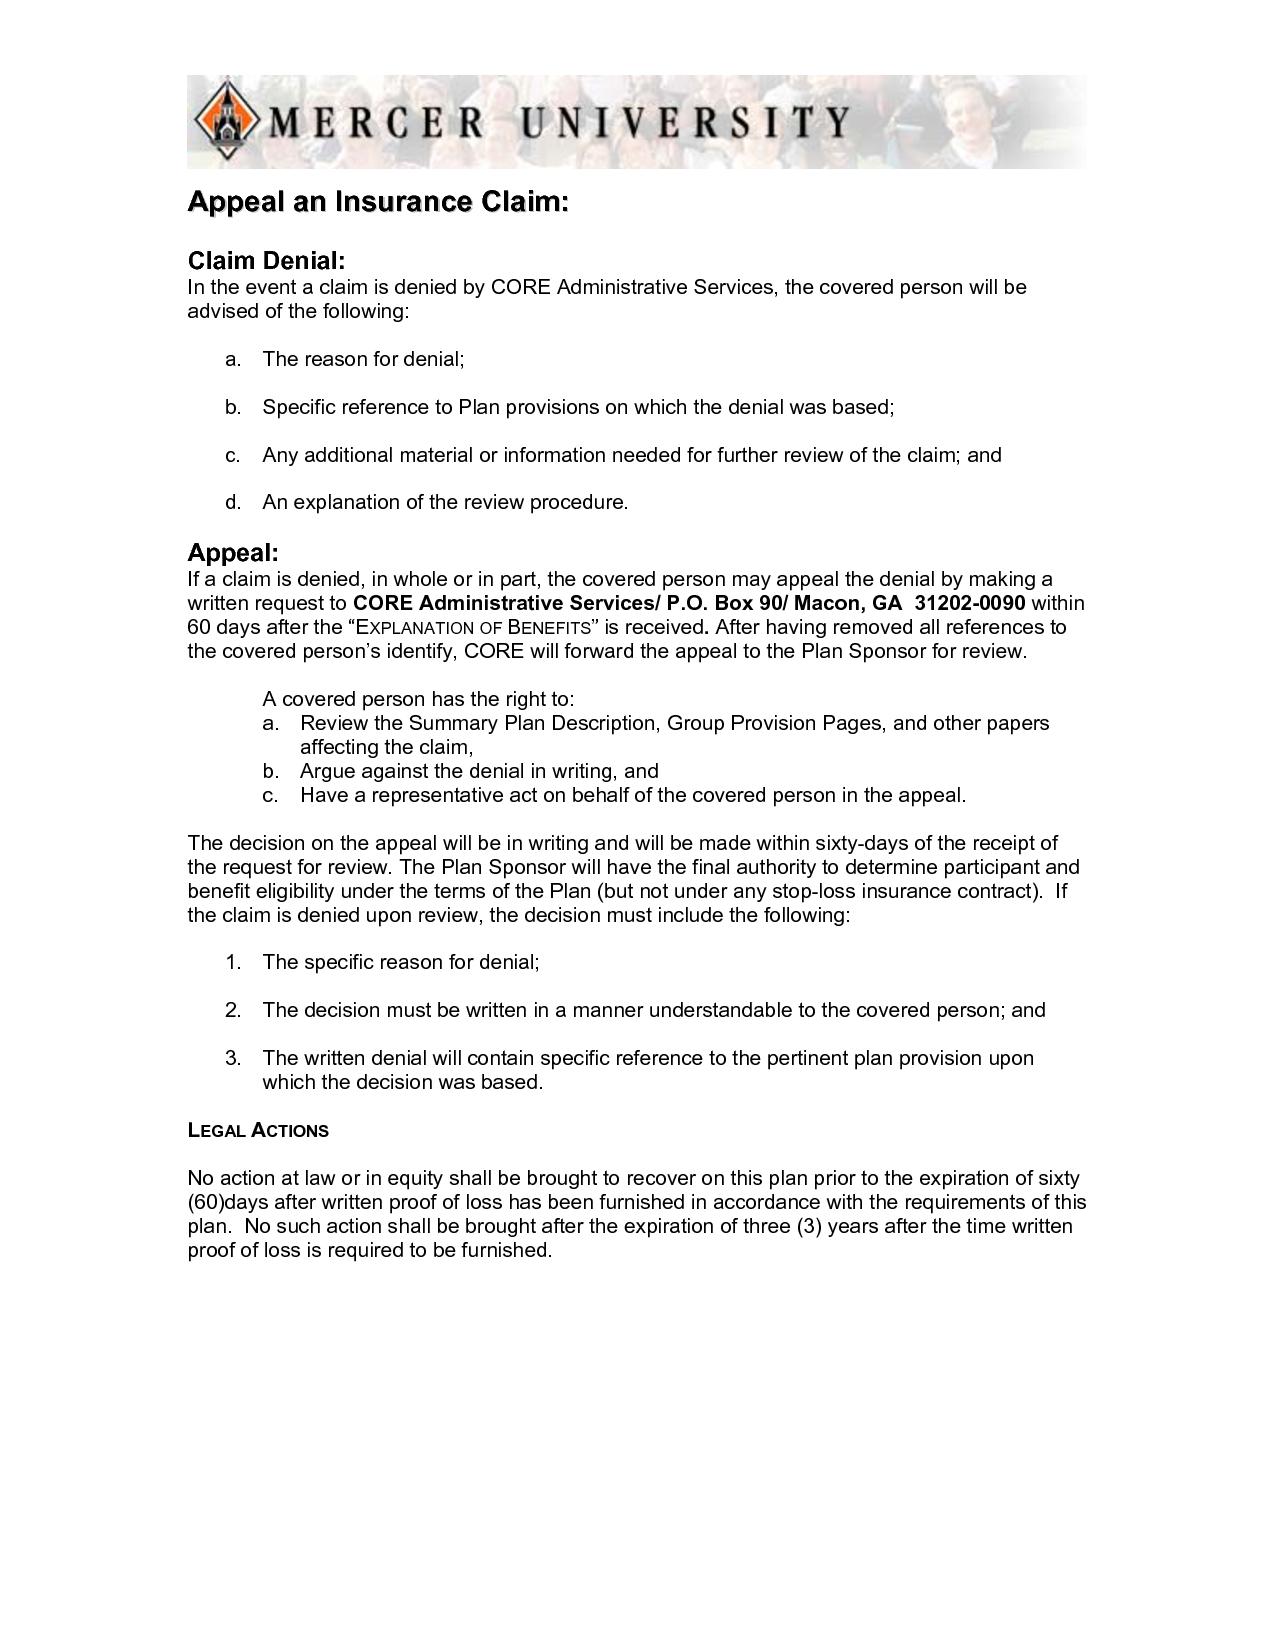 Appeal Letter Sample Medical Claim And Insurance Denial